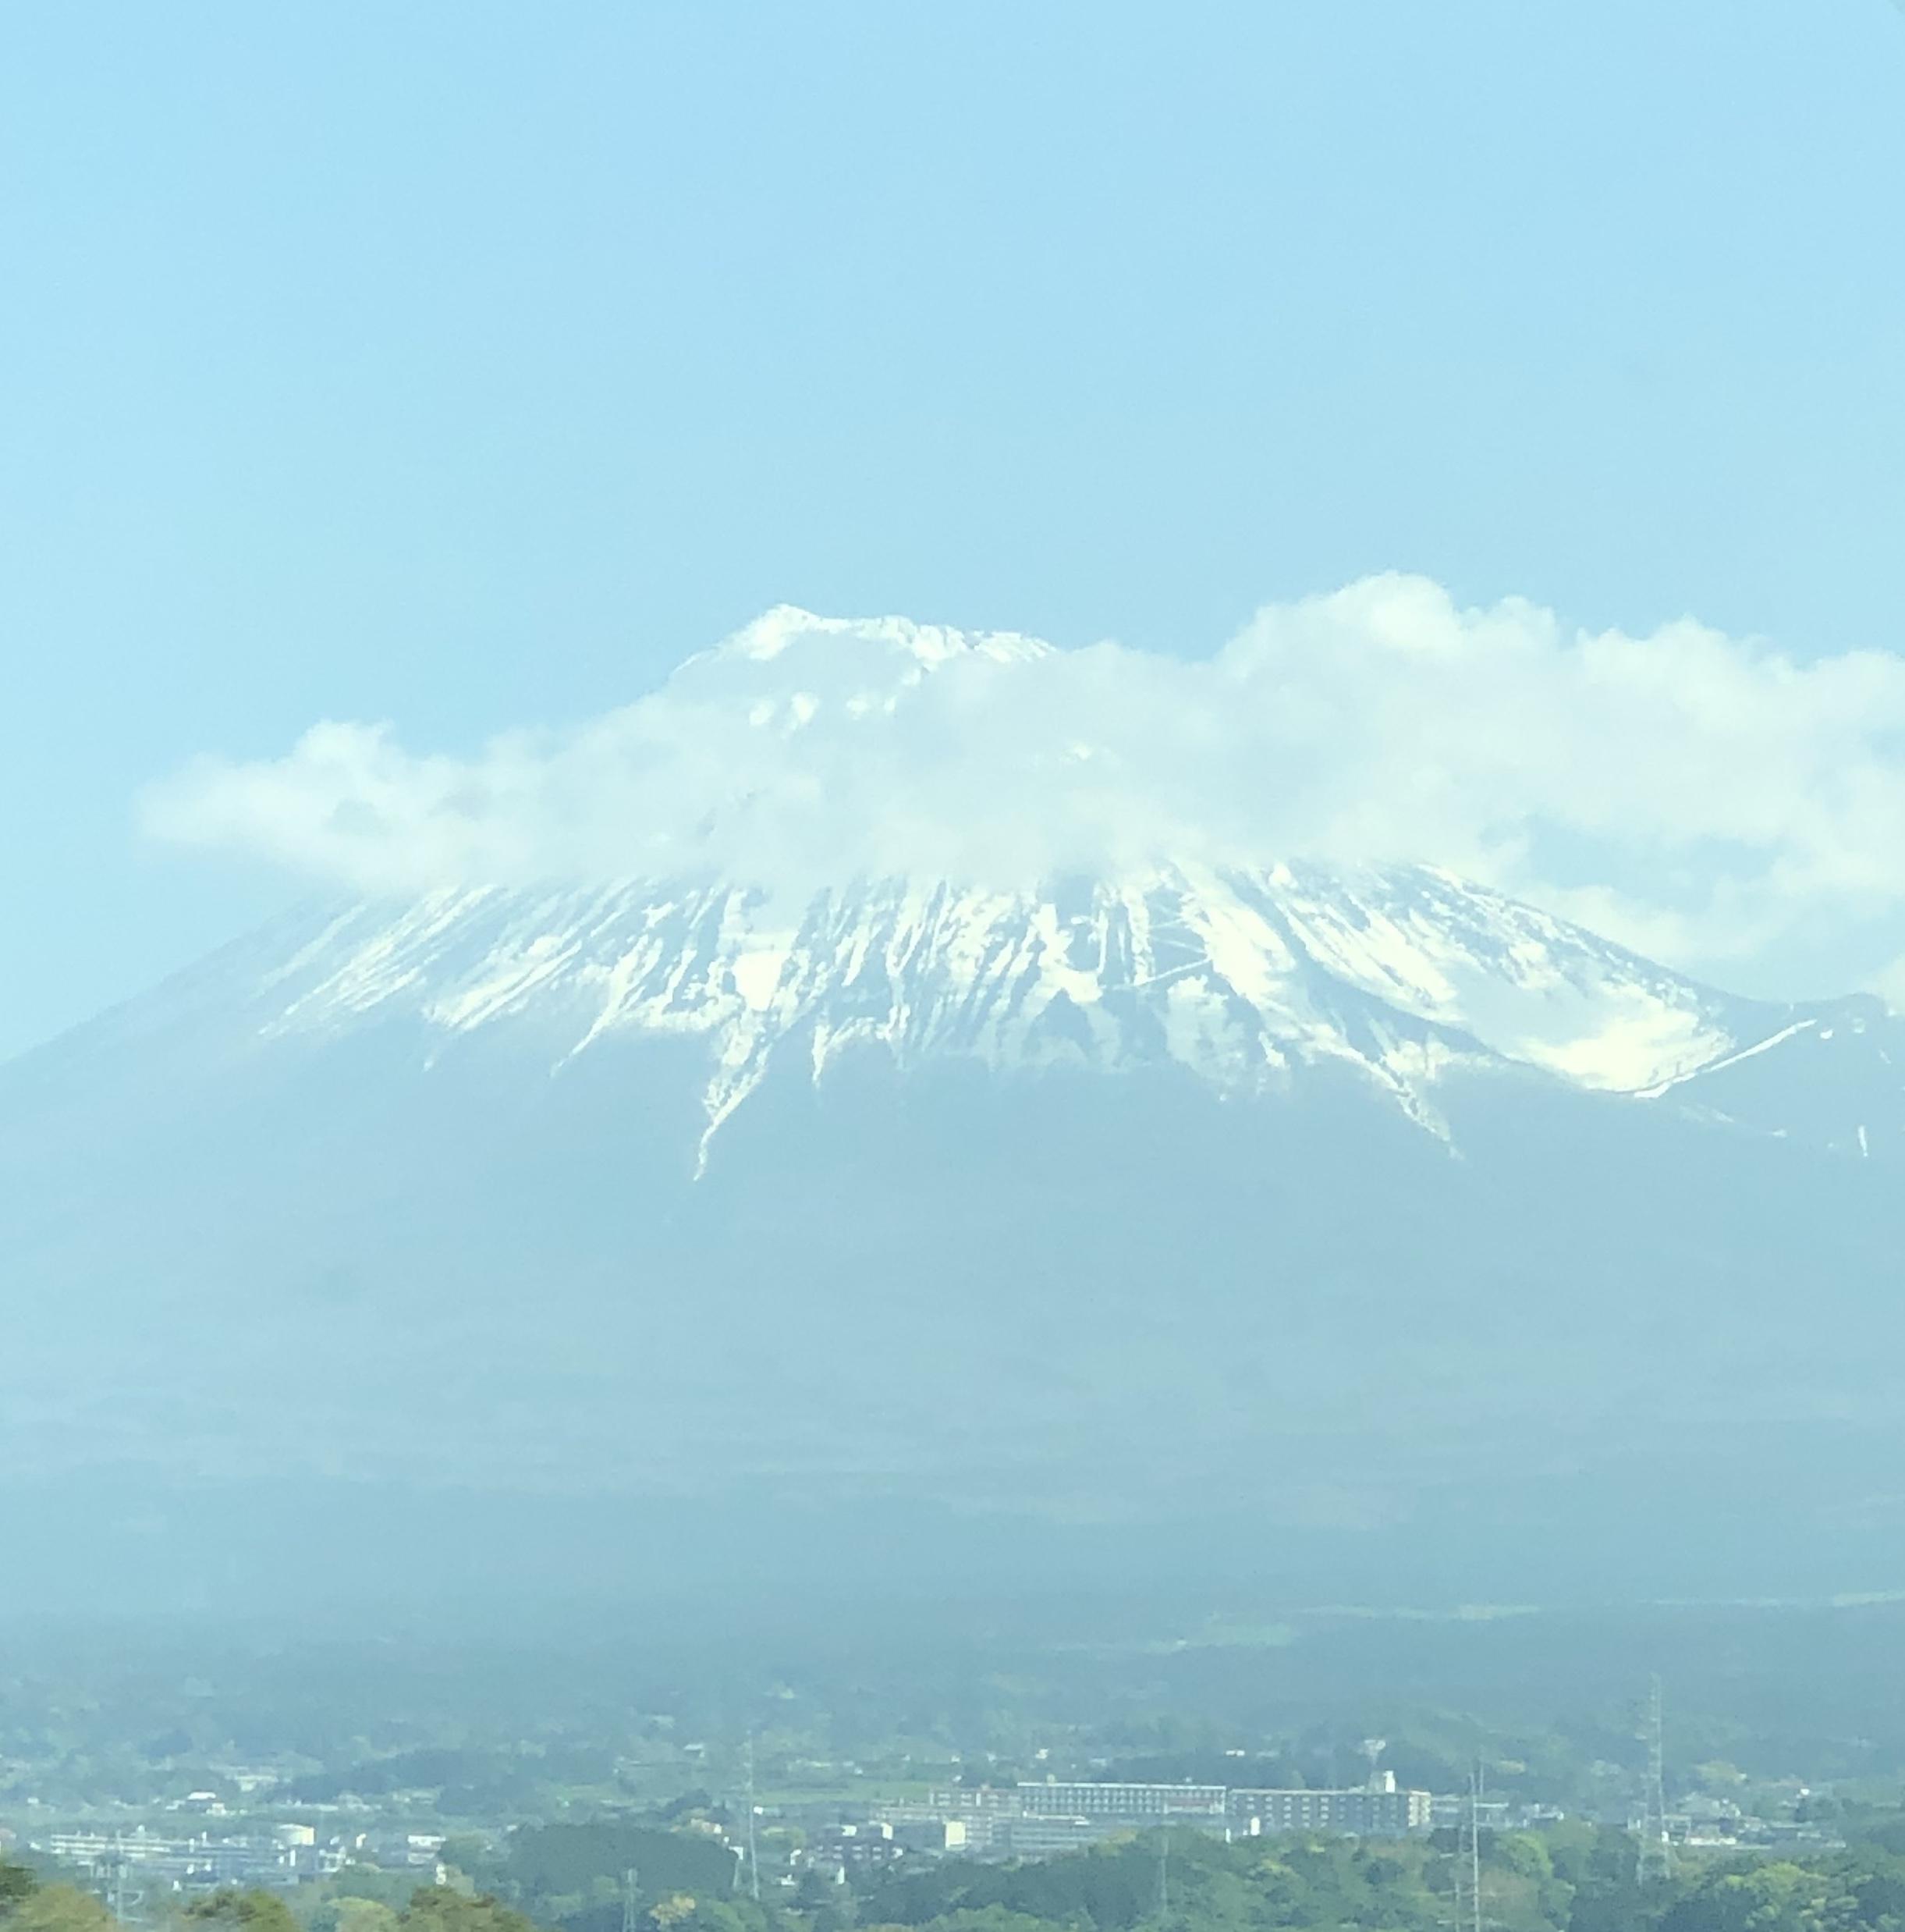 Mt. Fuji, from the Shinkansen (Bullet Train)